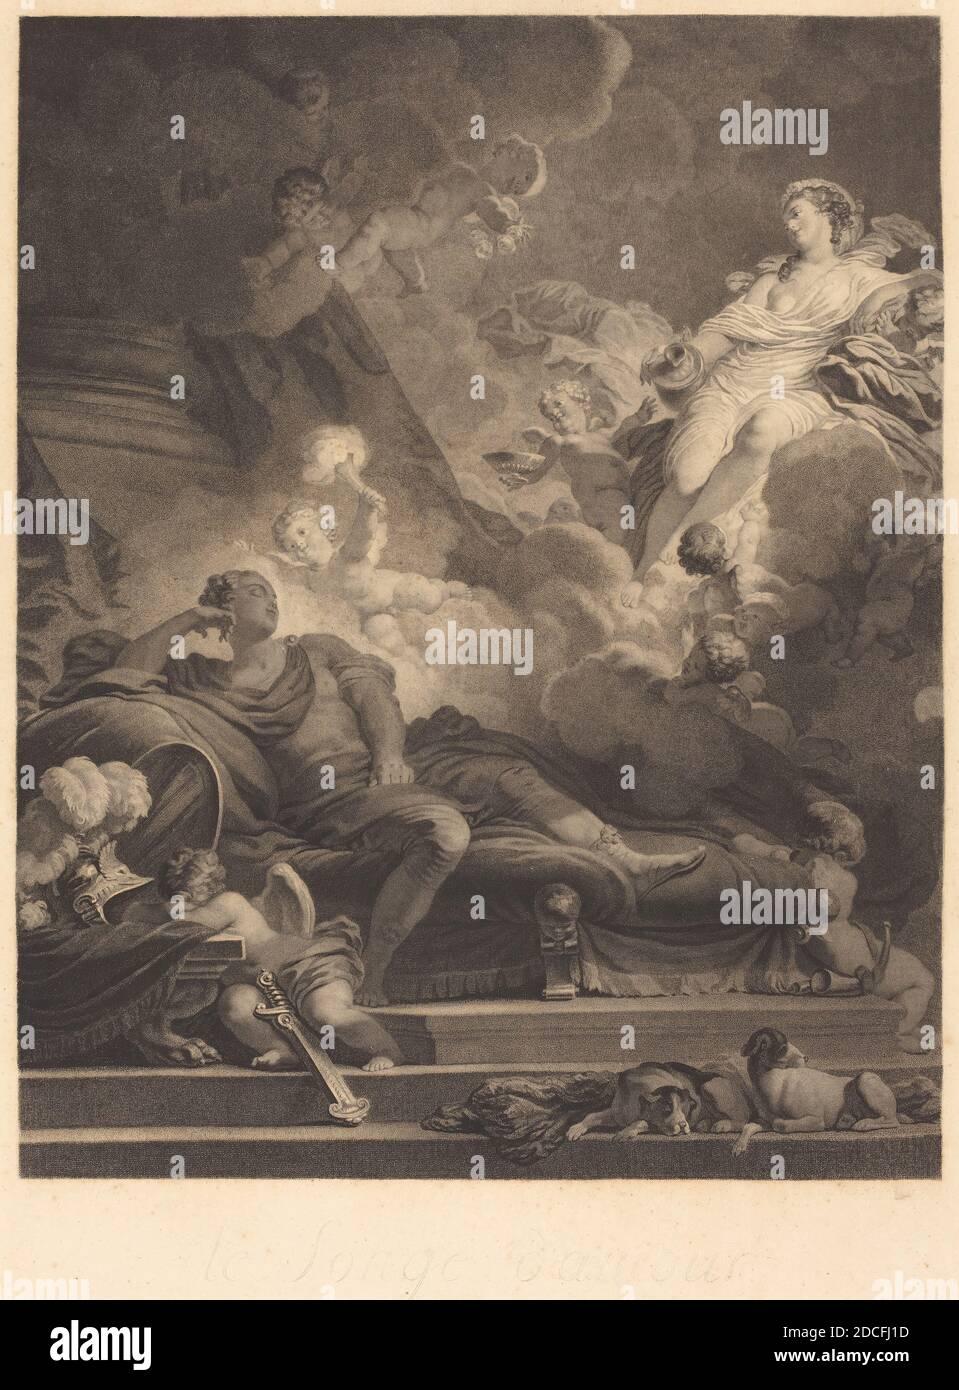 Nicolas François Regnault, (artist), French, 1746 - 1810, Jean Honoré Fragonard, (artist after), French, 1732 - 1806, Le Songe d'Amour (Love's Dream), 1785, stipple etching Stock Photo